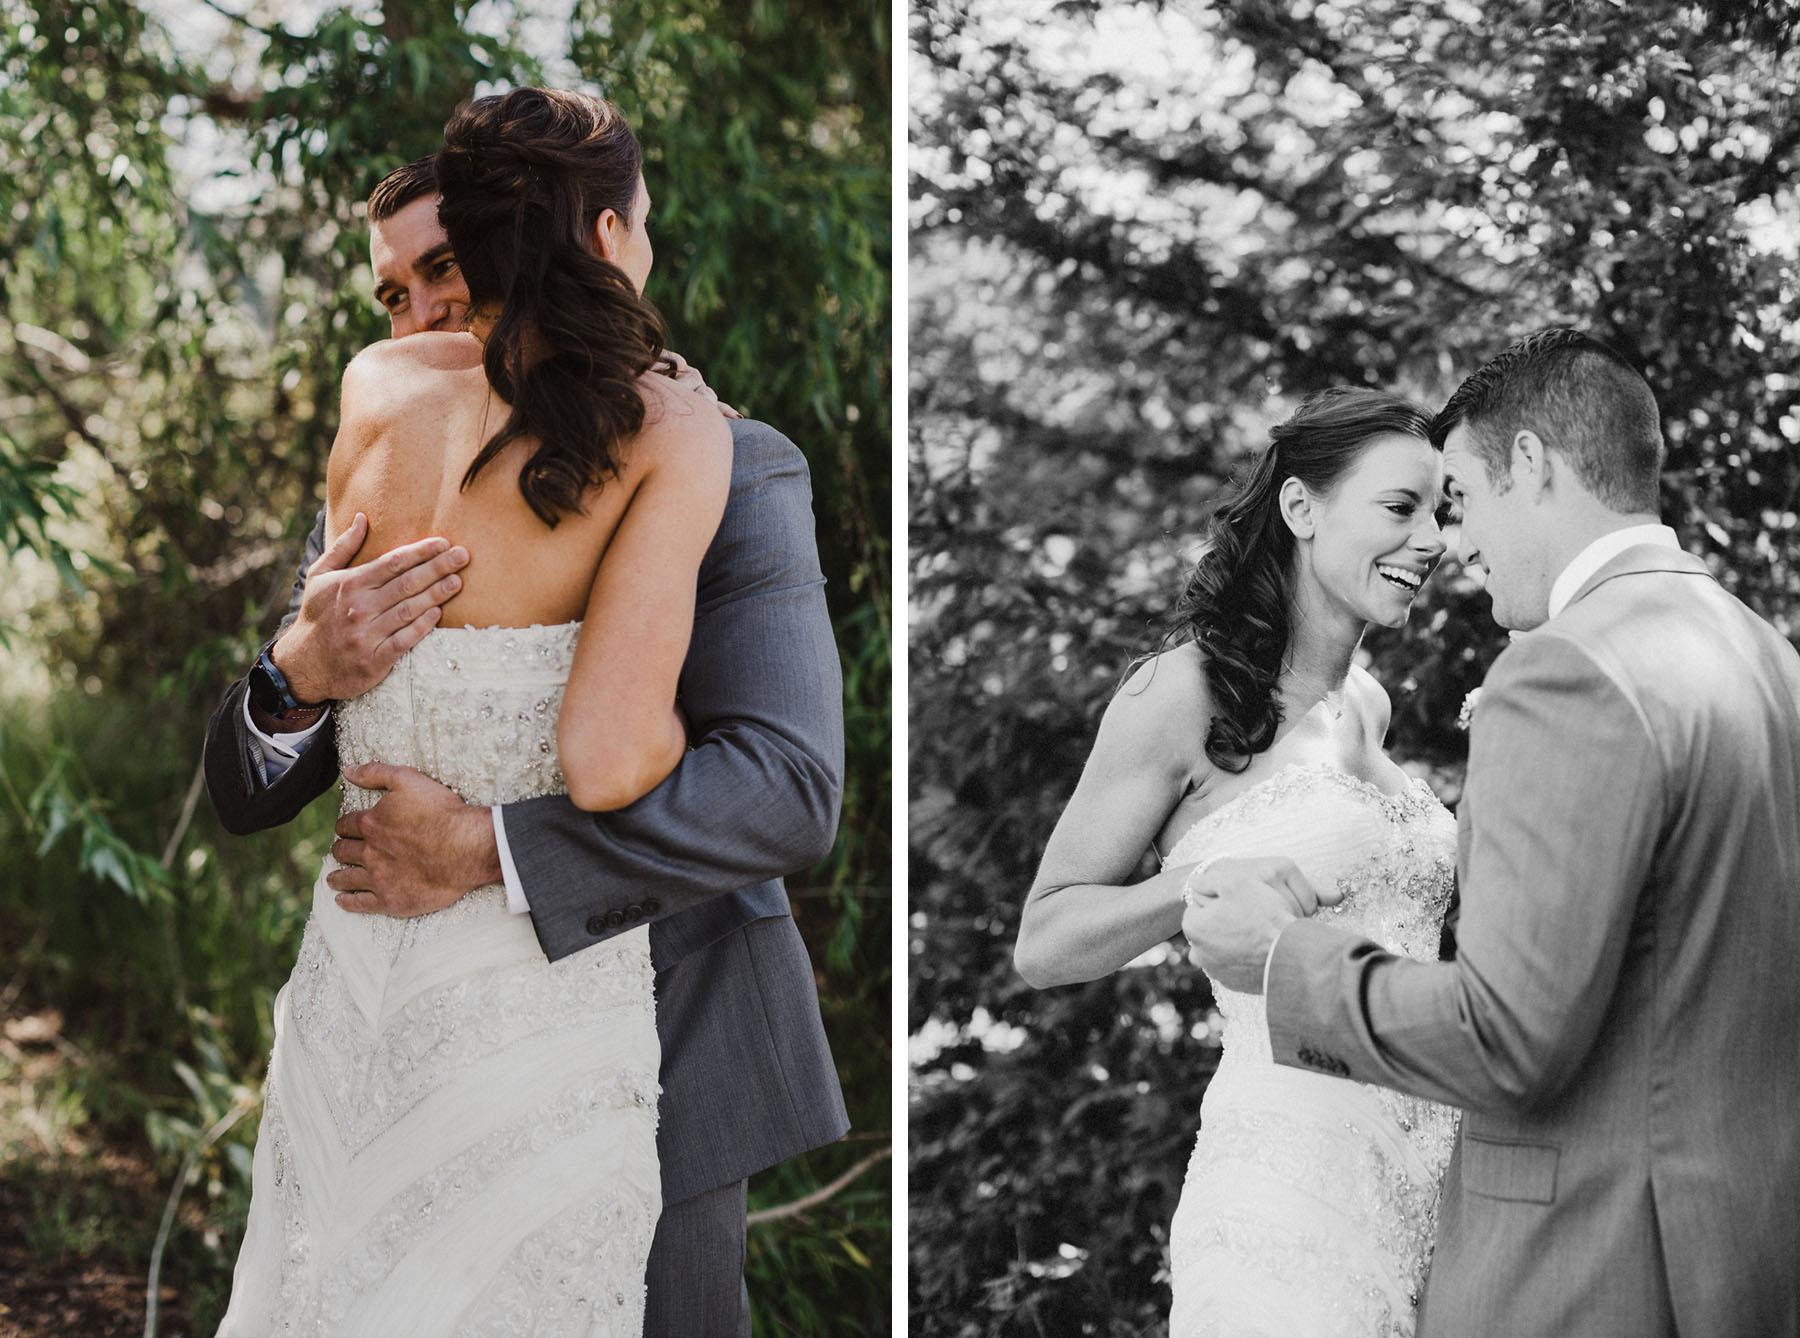 C+J-Grace-Maralyn-Estate-wedding-2.jpg